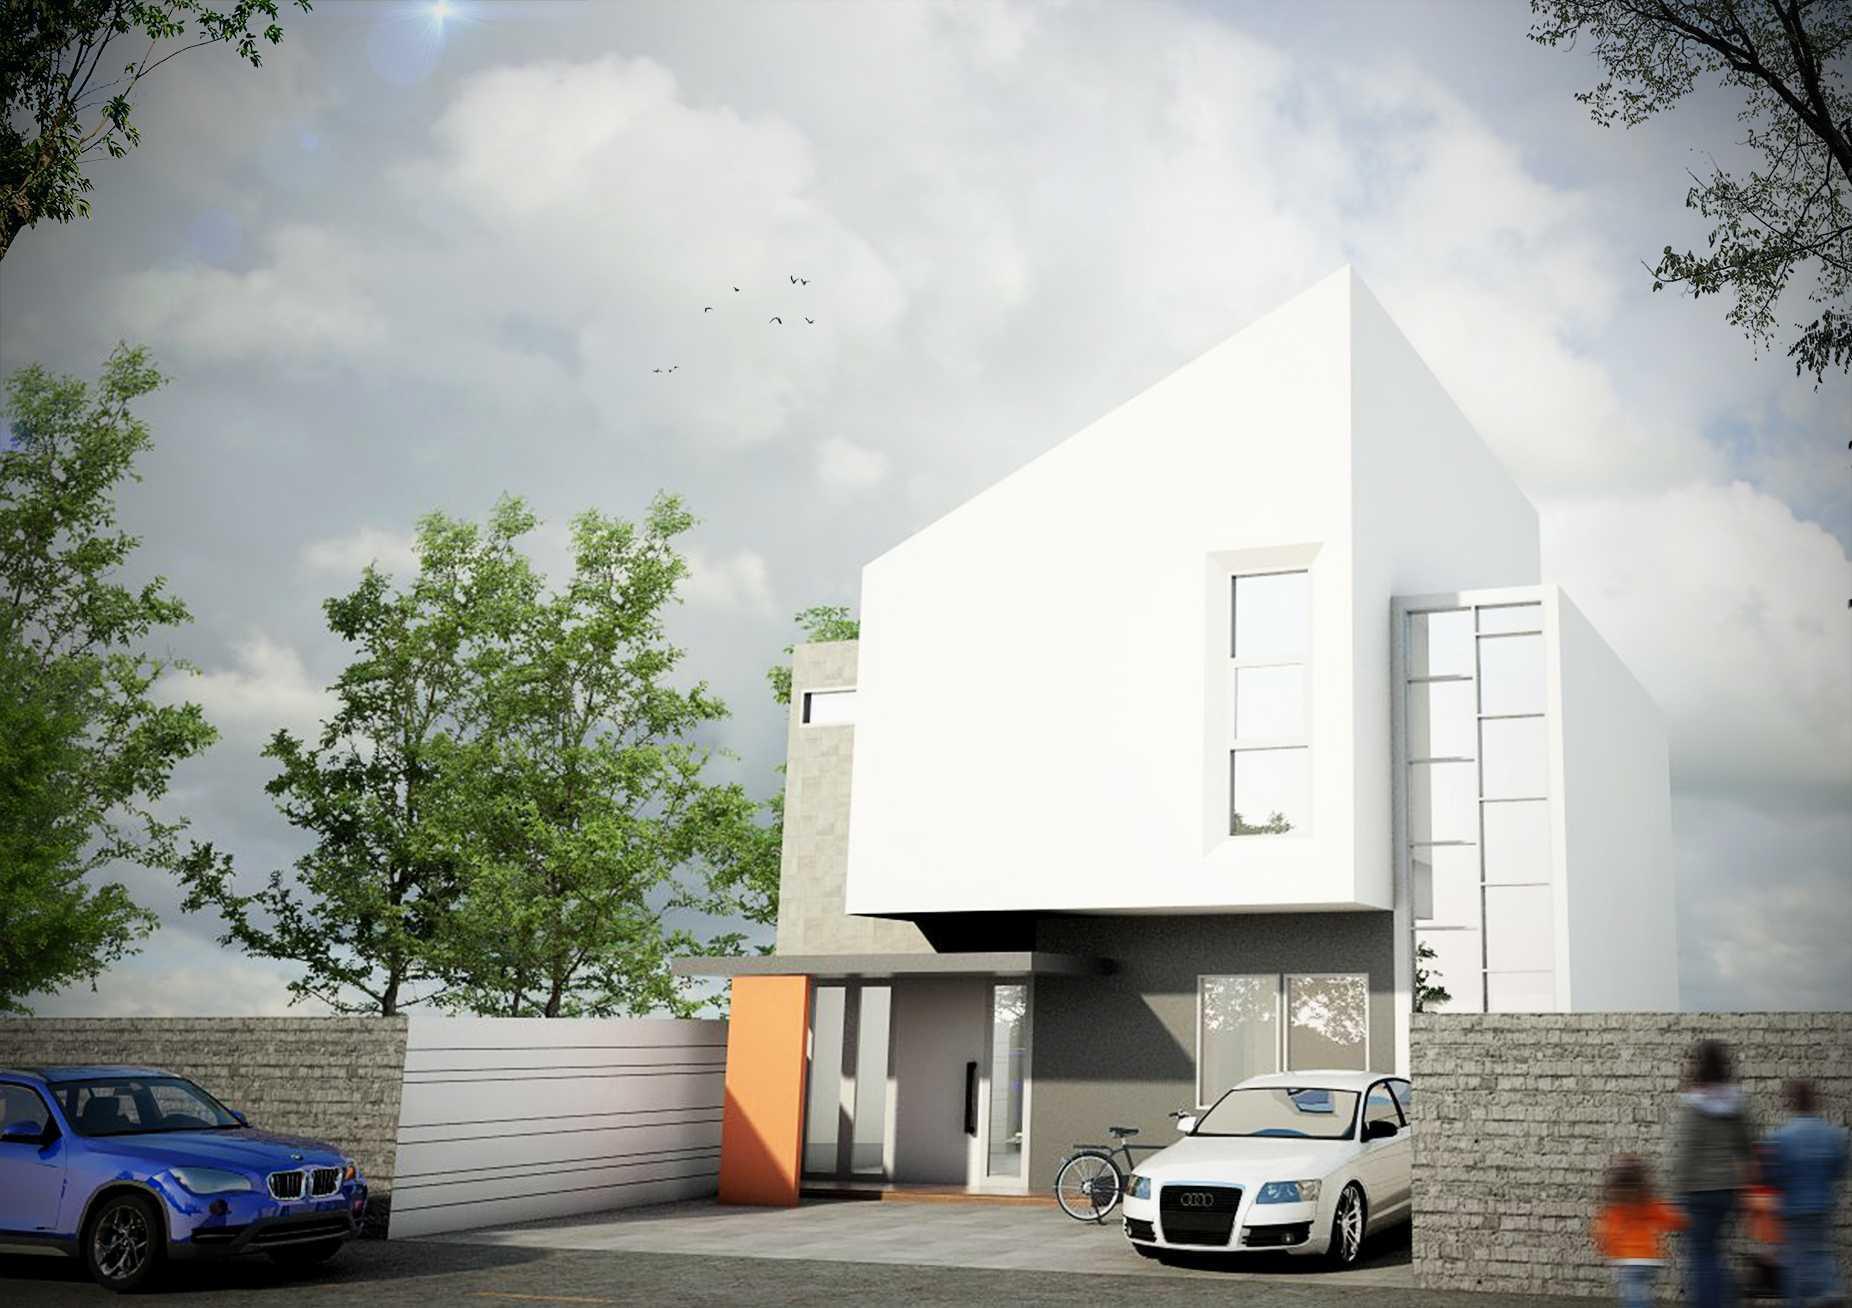 Sabio Design Modern White Facade House - Jakarta Jakarta, Daerah Khusus Ibukota Jakarta, Indonesia Jakarta, Daerah Khusus Ibukota Jakarta, Indonesia Sabio-Design-Modern-White-Facade-House-Jakarta  119841